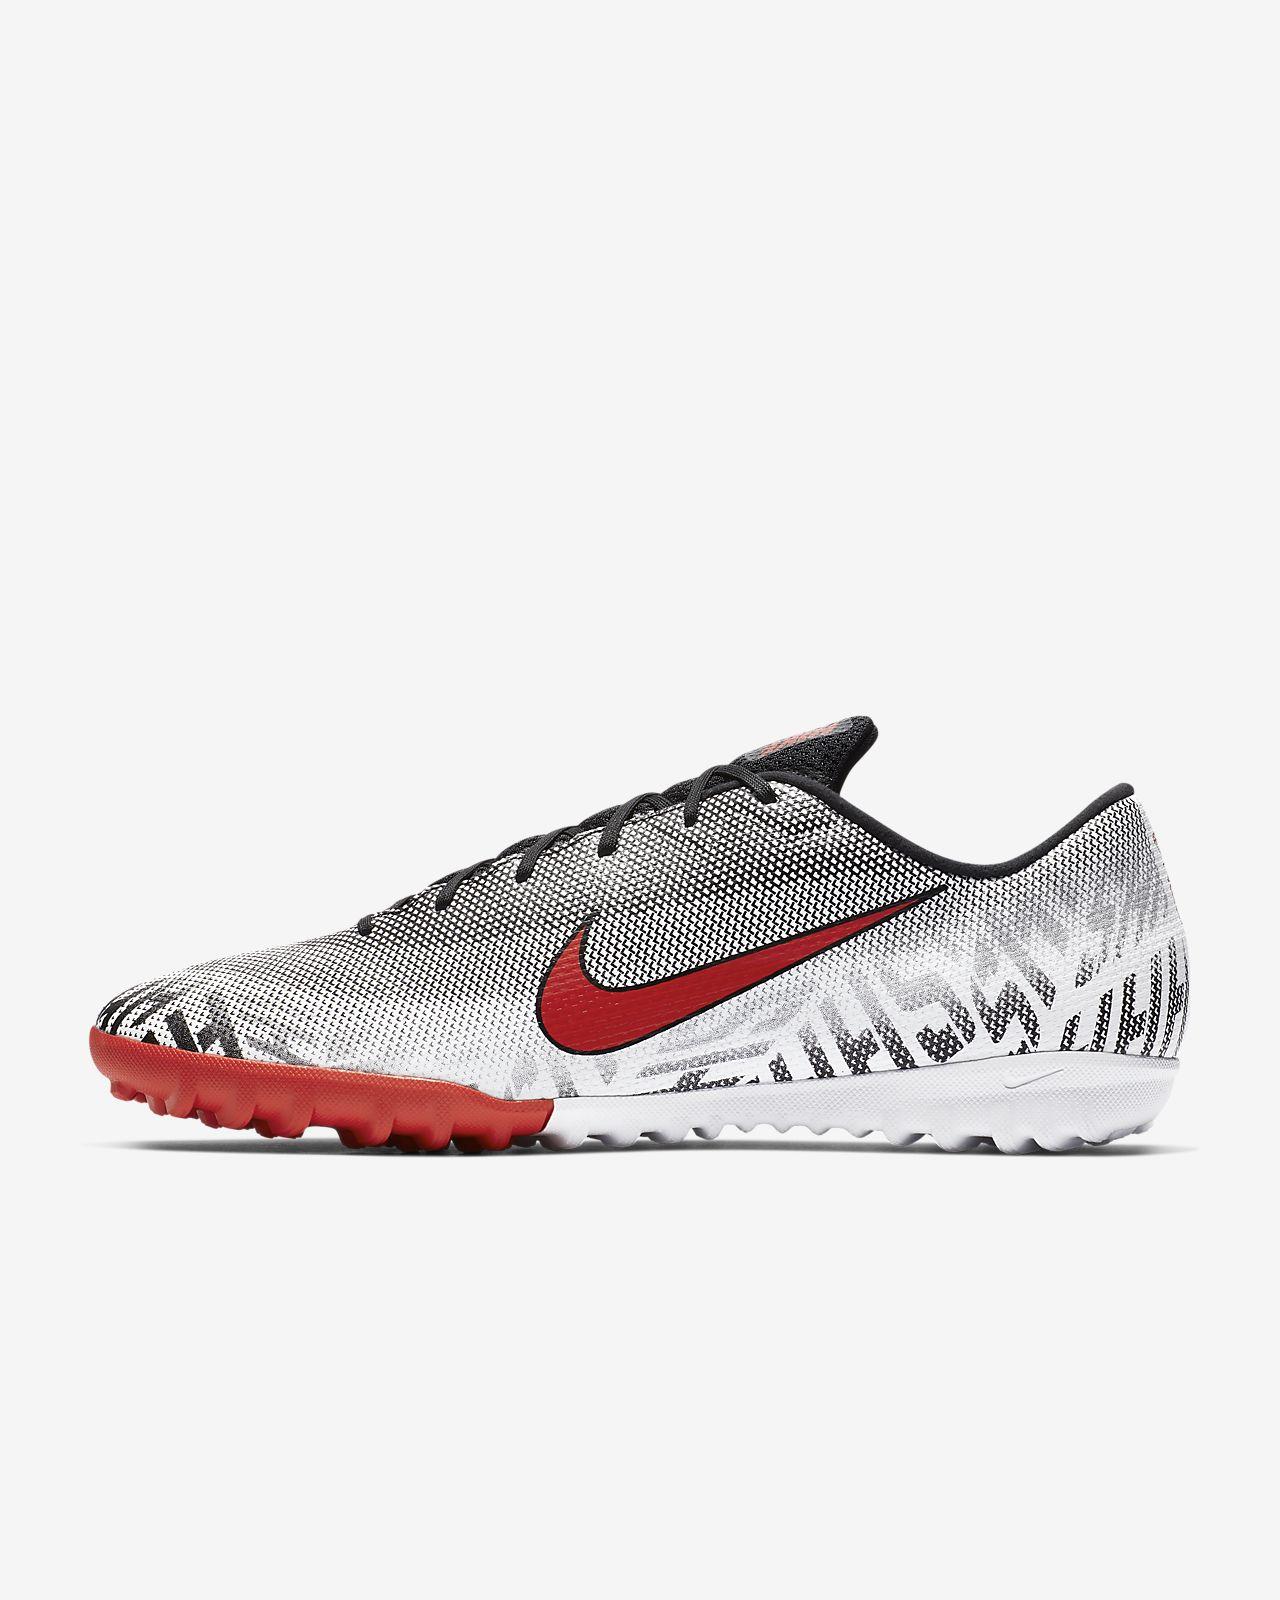 5064b099c20e4 ... Nike Mercurial Vapor XII Academy Neymar TF Botas de fútbol para hierba  artificial o moqueta -